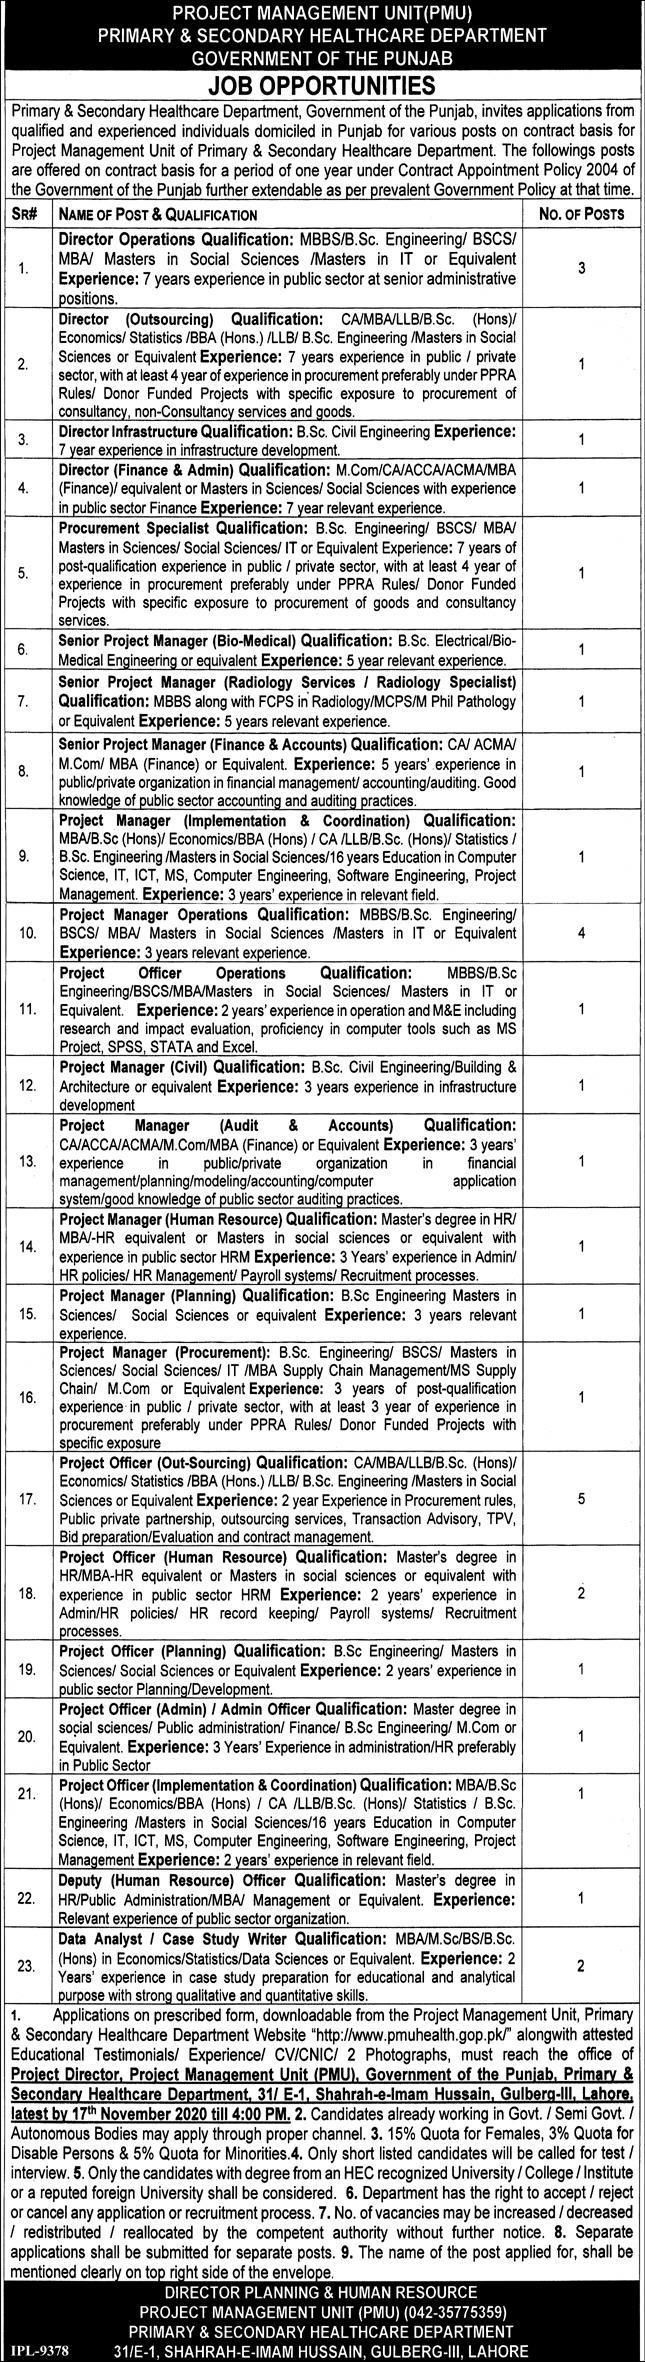 Project Management Unit PMU Latest Jobs in Pakistan Jobs 2021-2022 - Online Apply - www.pmuhealth.gop.pk